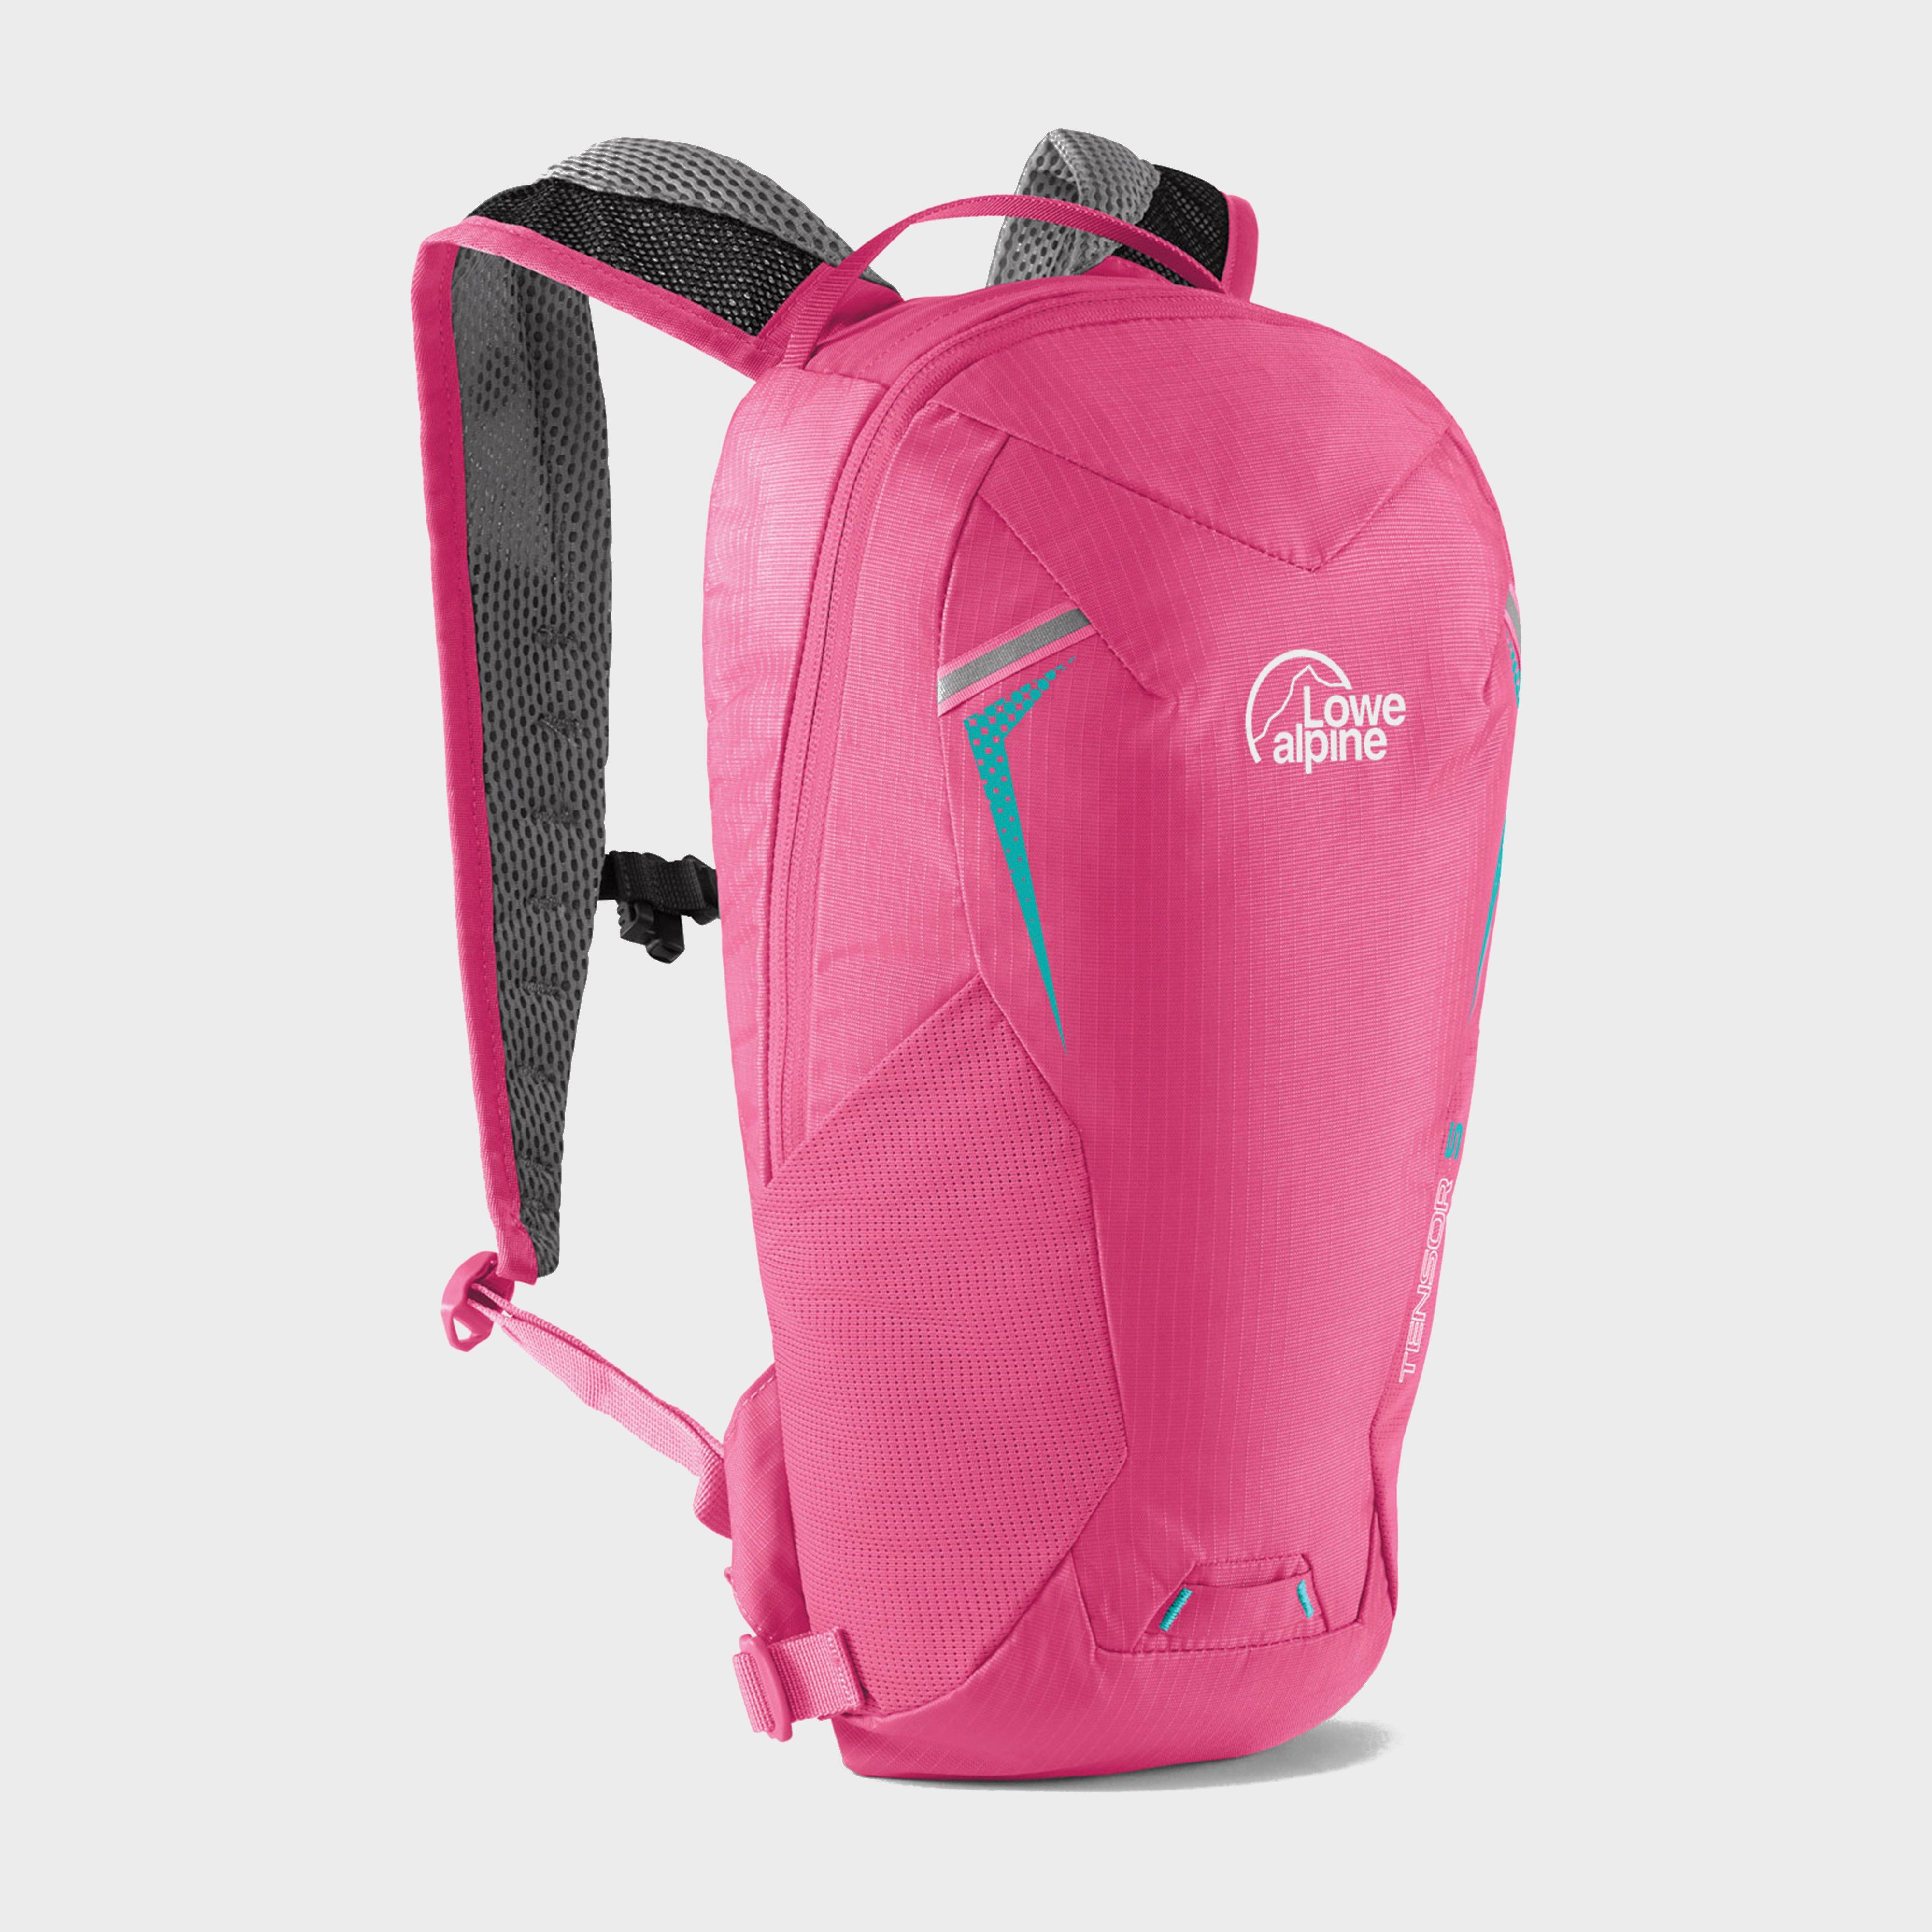 Lowe Alpine Lowe Alpine Tensor 5 Daysack - Pink, Pink